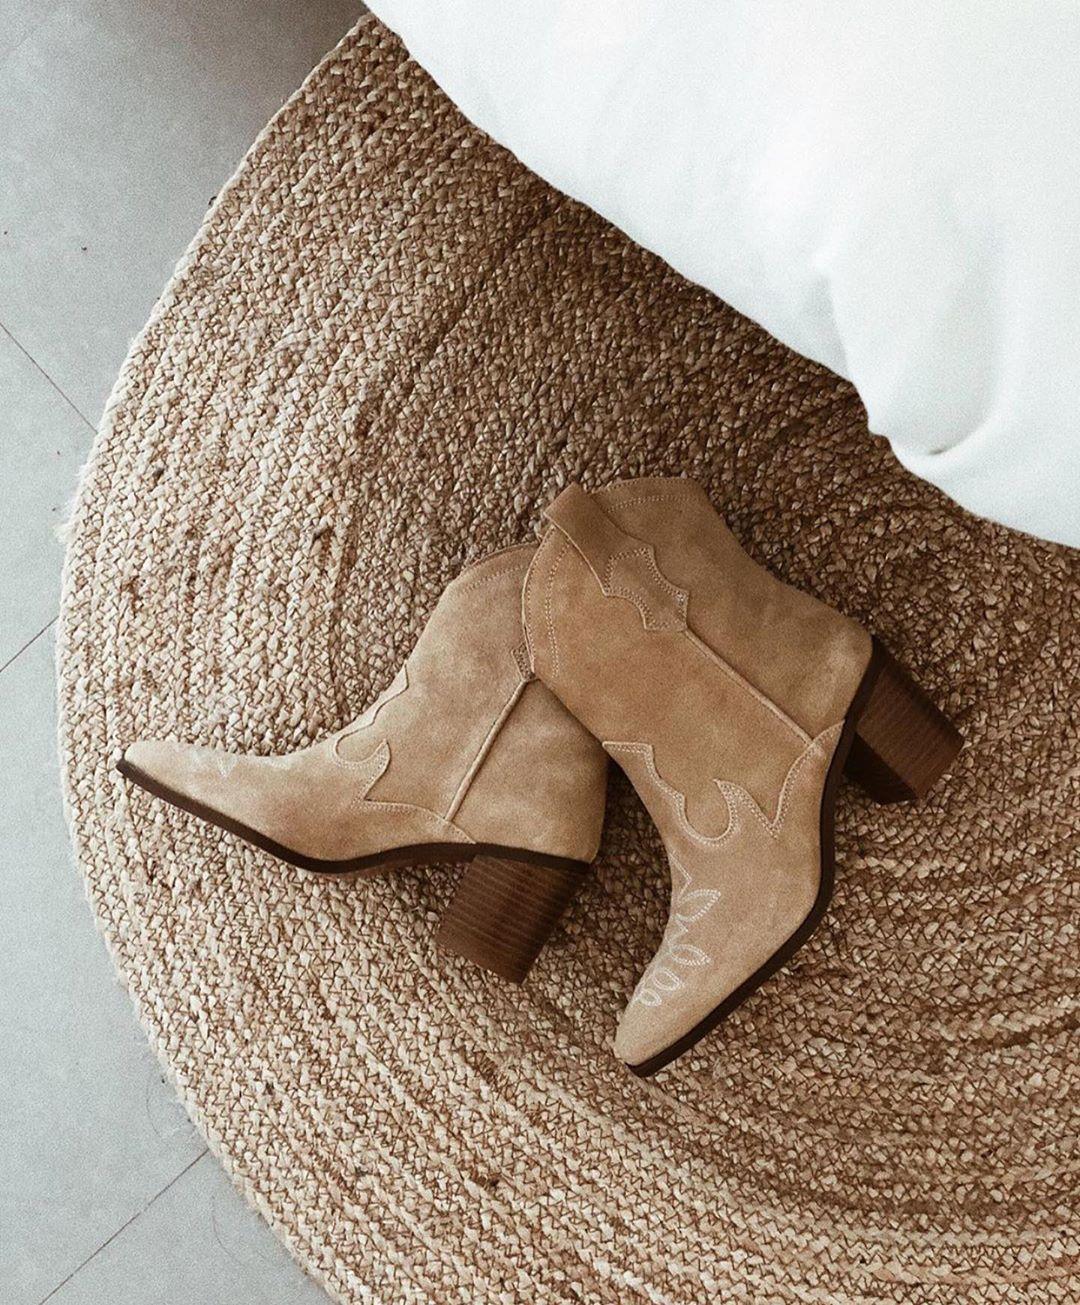 leather crust ankle boots with cowboy heels de Zara sur zaraaddiction